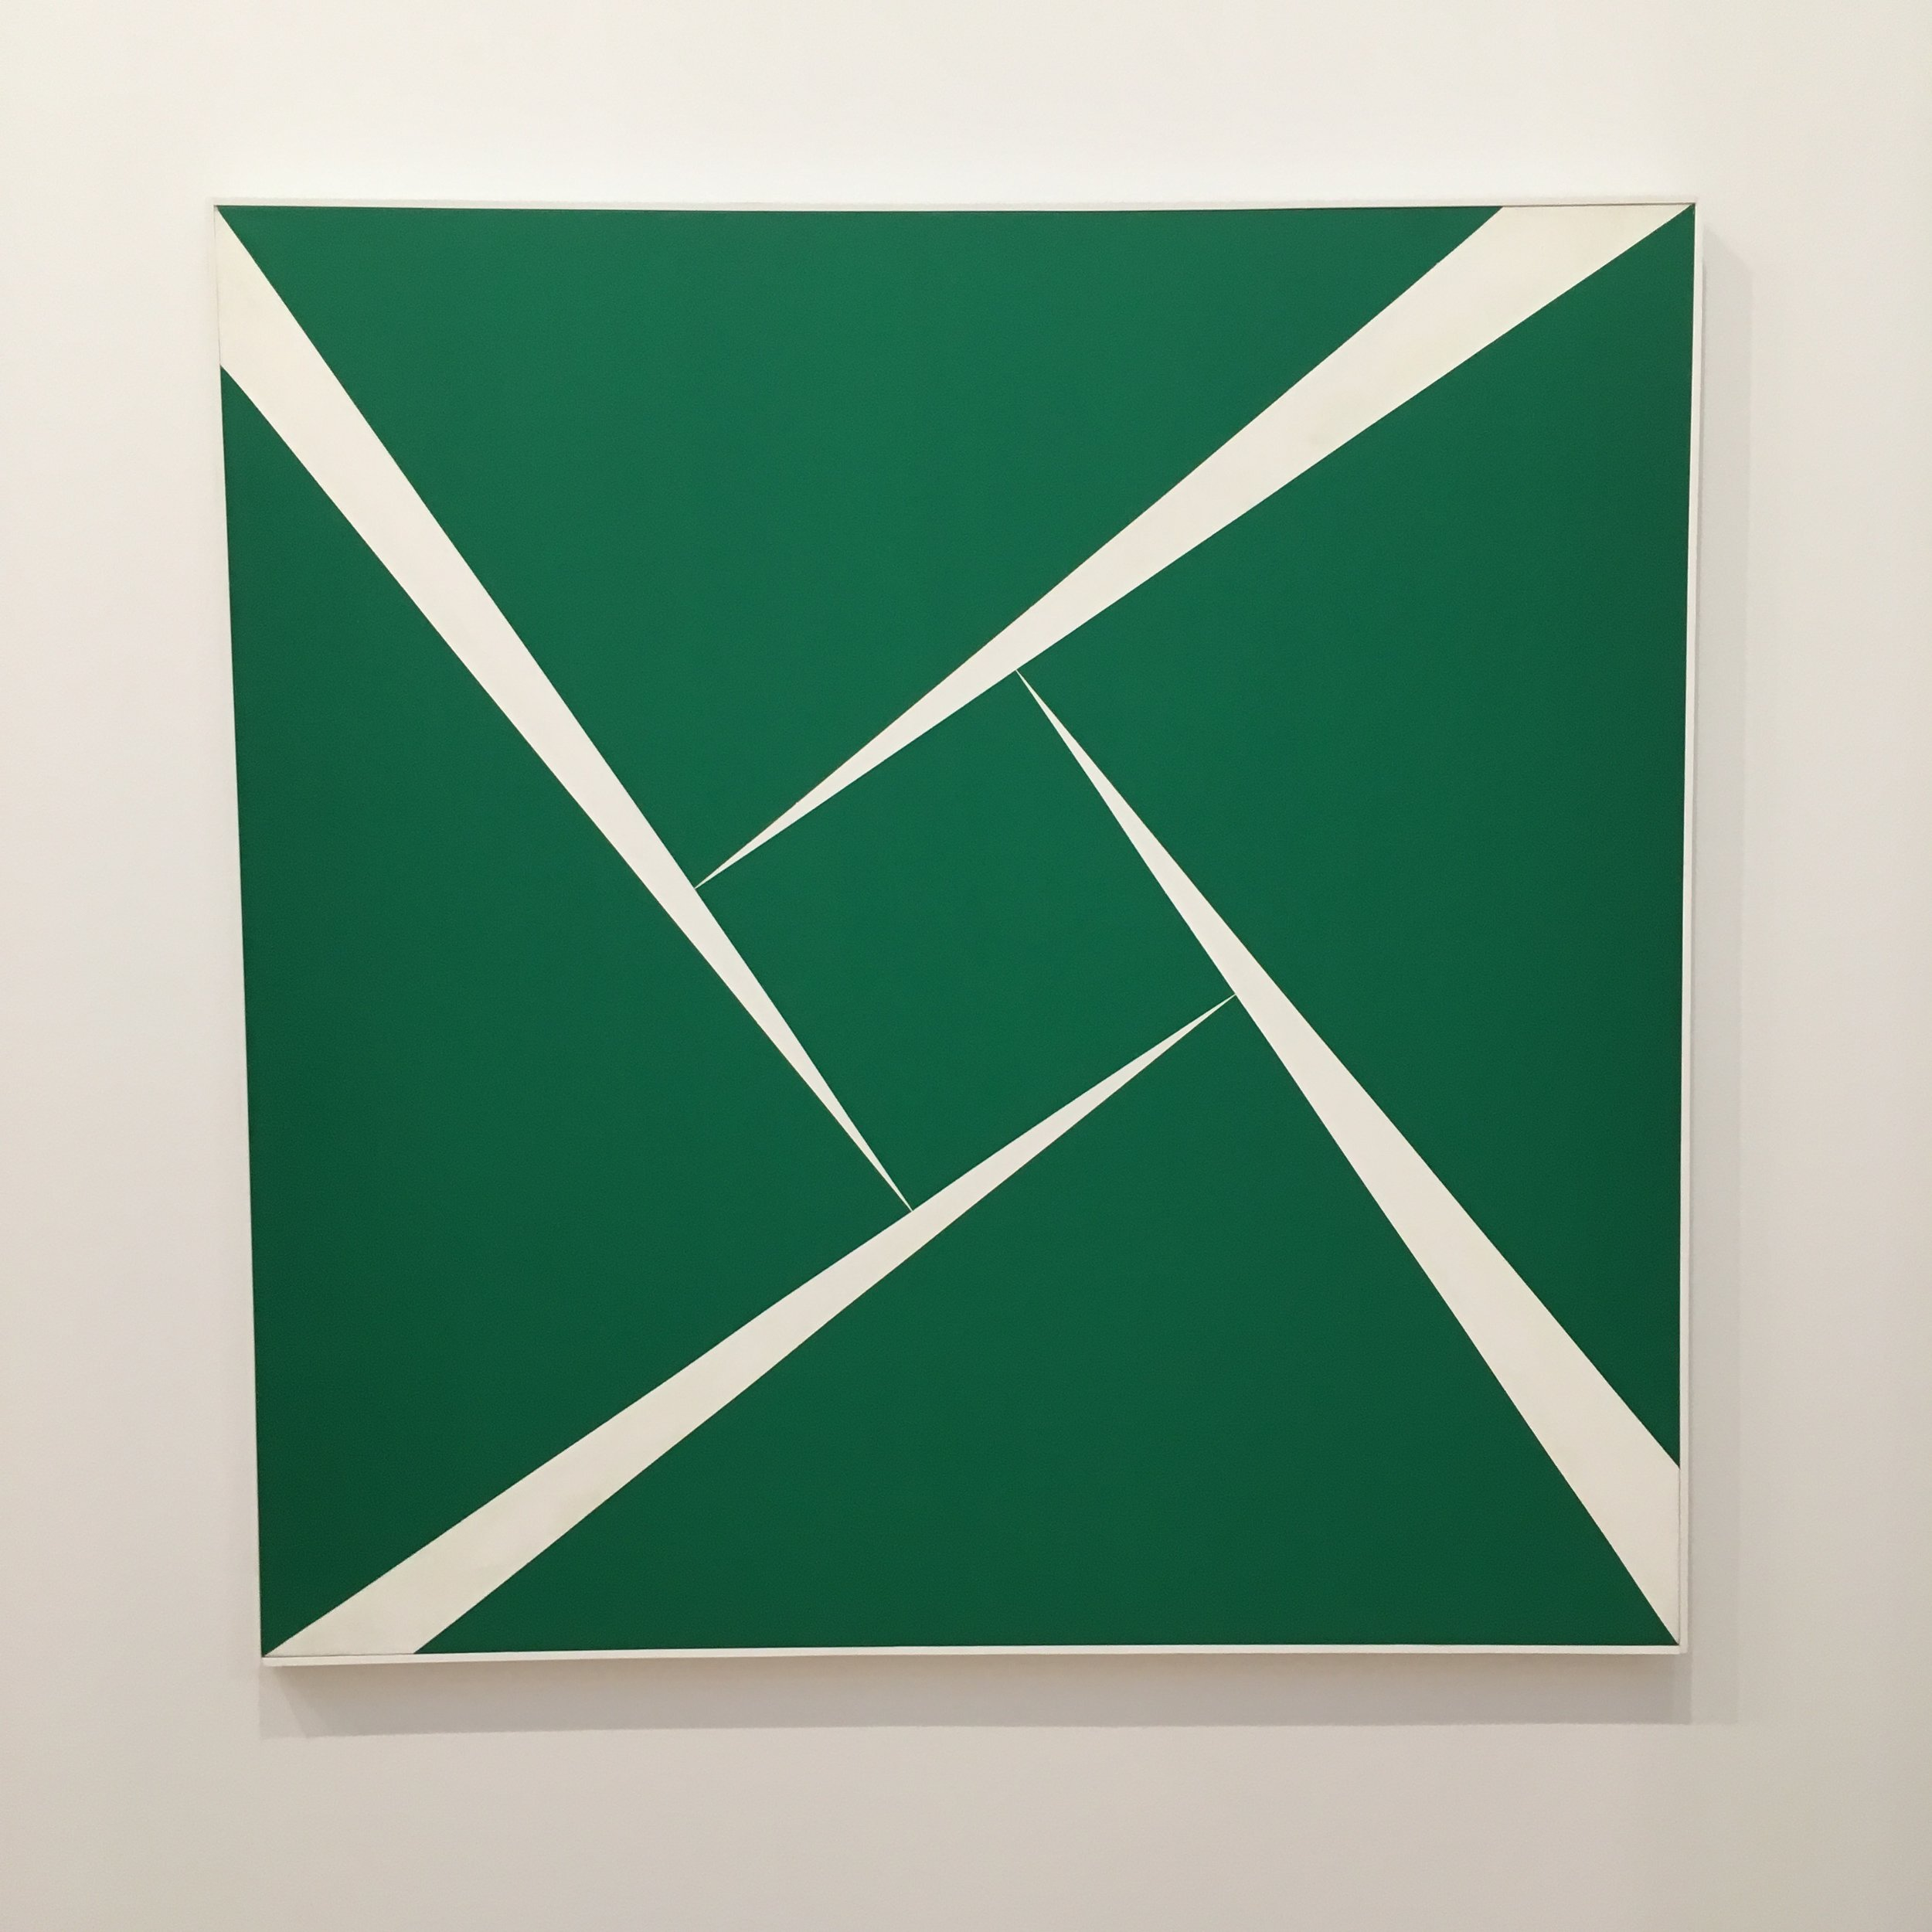 Carmen Herrera: Lines of Sight Exhibit